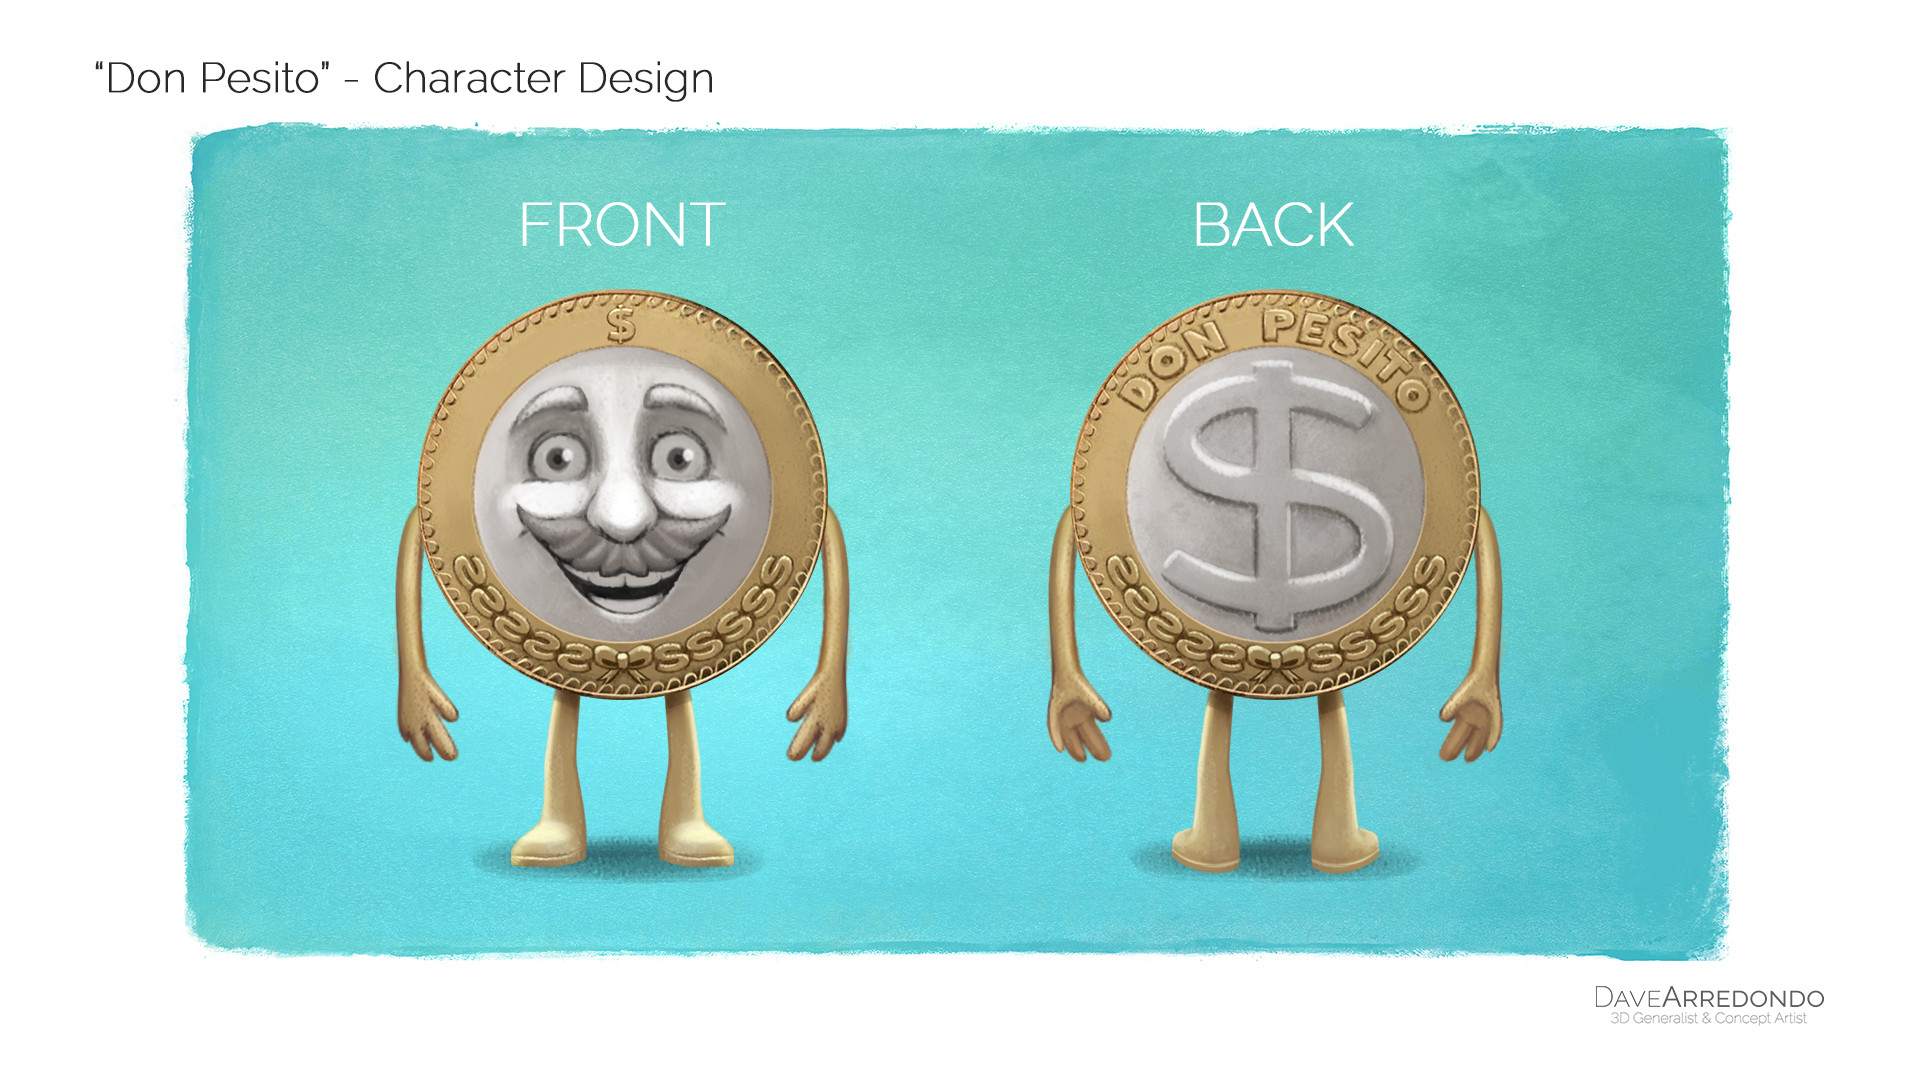 Dave arredondo donpesito characterdesign 001